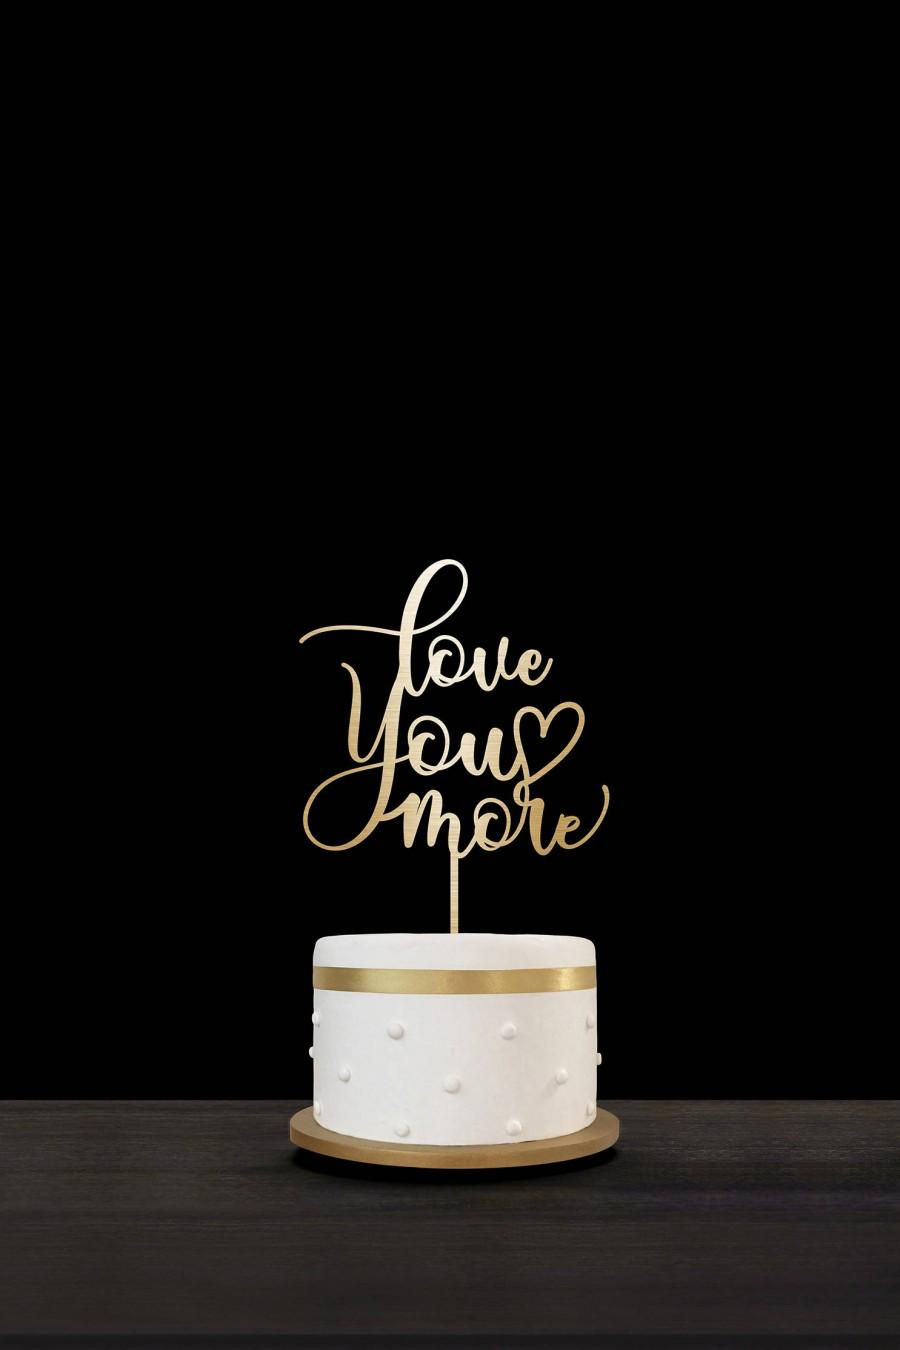 Свадьба - Customized Wedding Cake Topper, Personalized Cake Topper for Wedding, Custom Personalized Wedding Cake Topper, Love You More Cake Topper 07